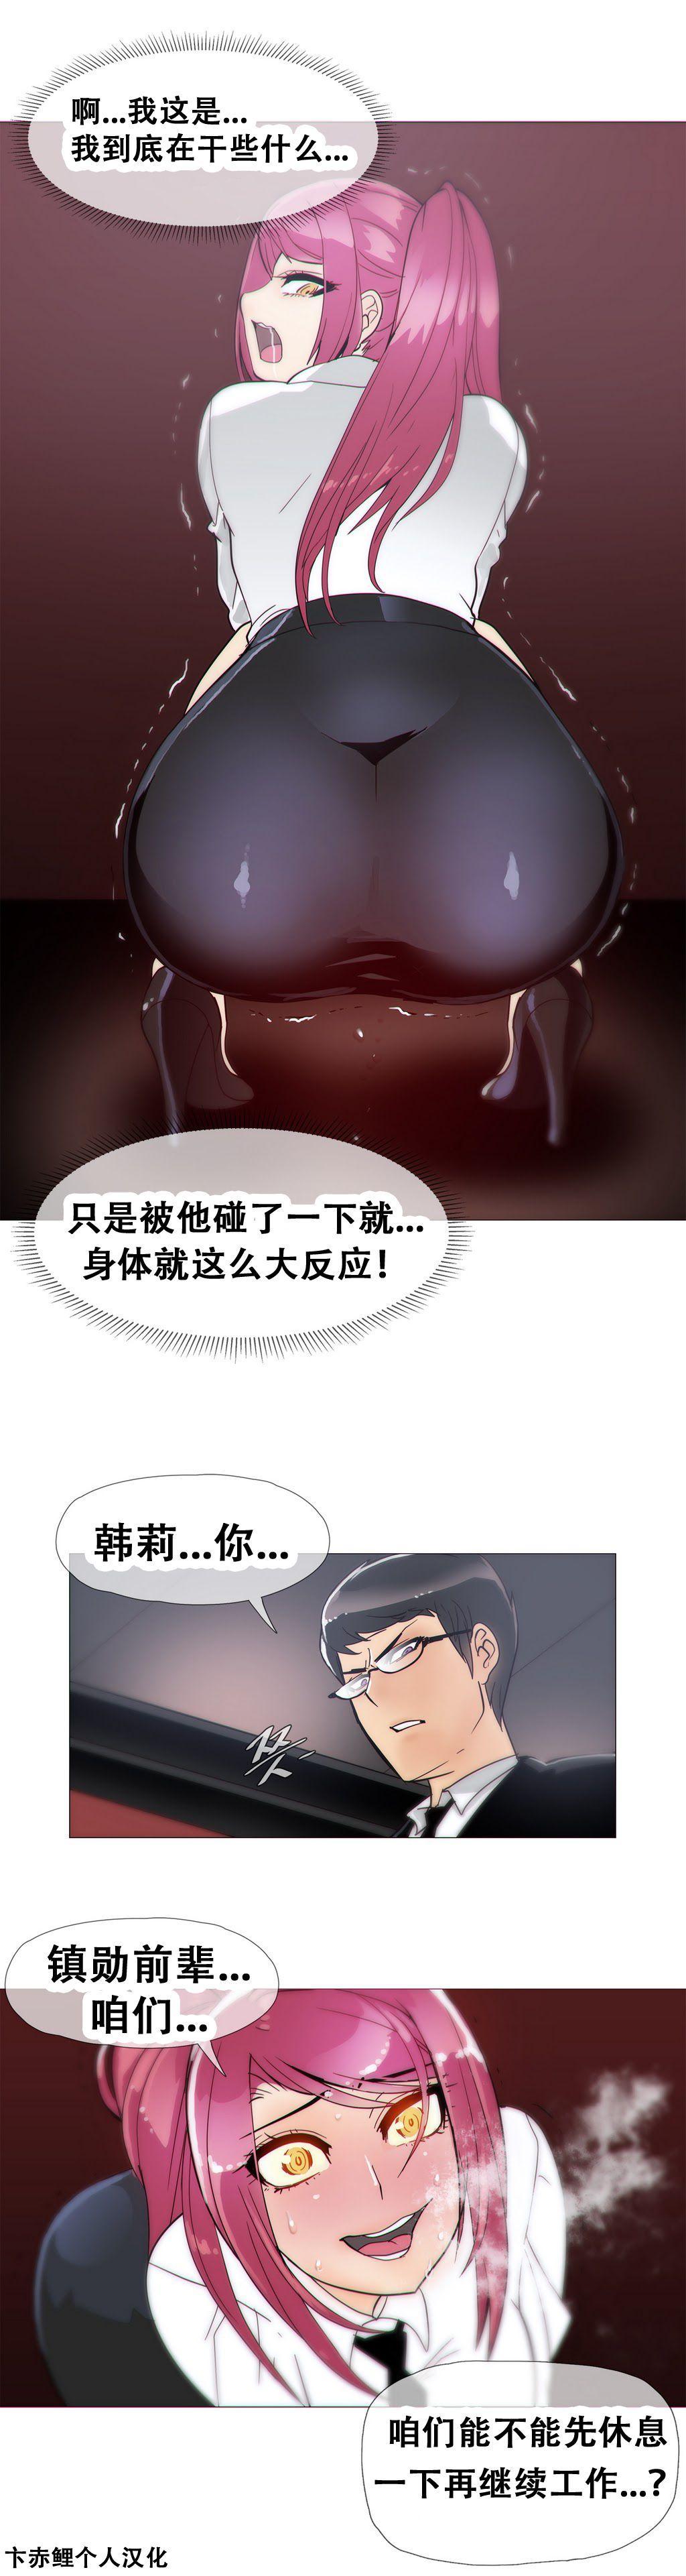 HouseHold Affairs 【卞赤鲤个人汉化】1~33话(持续更新中) 312